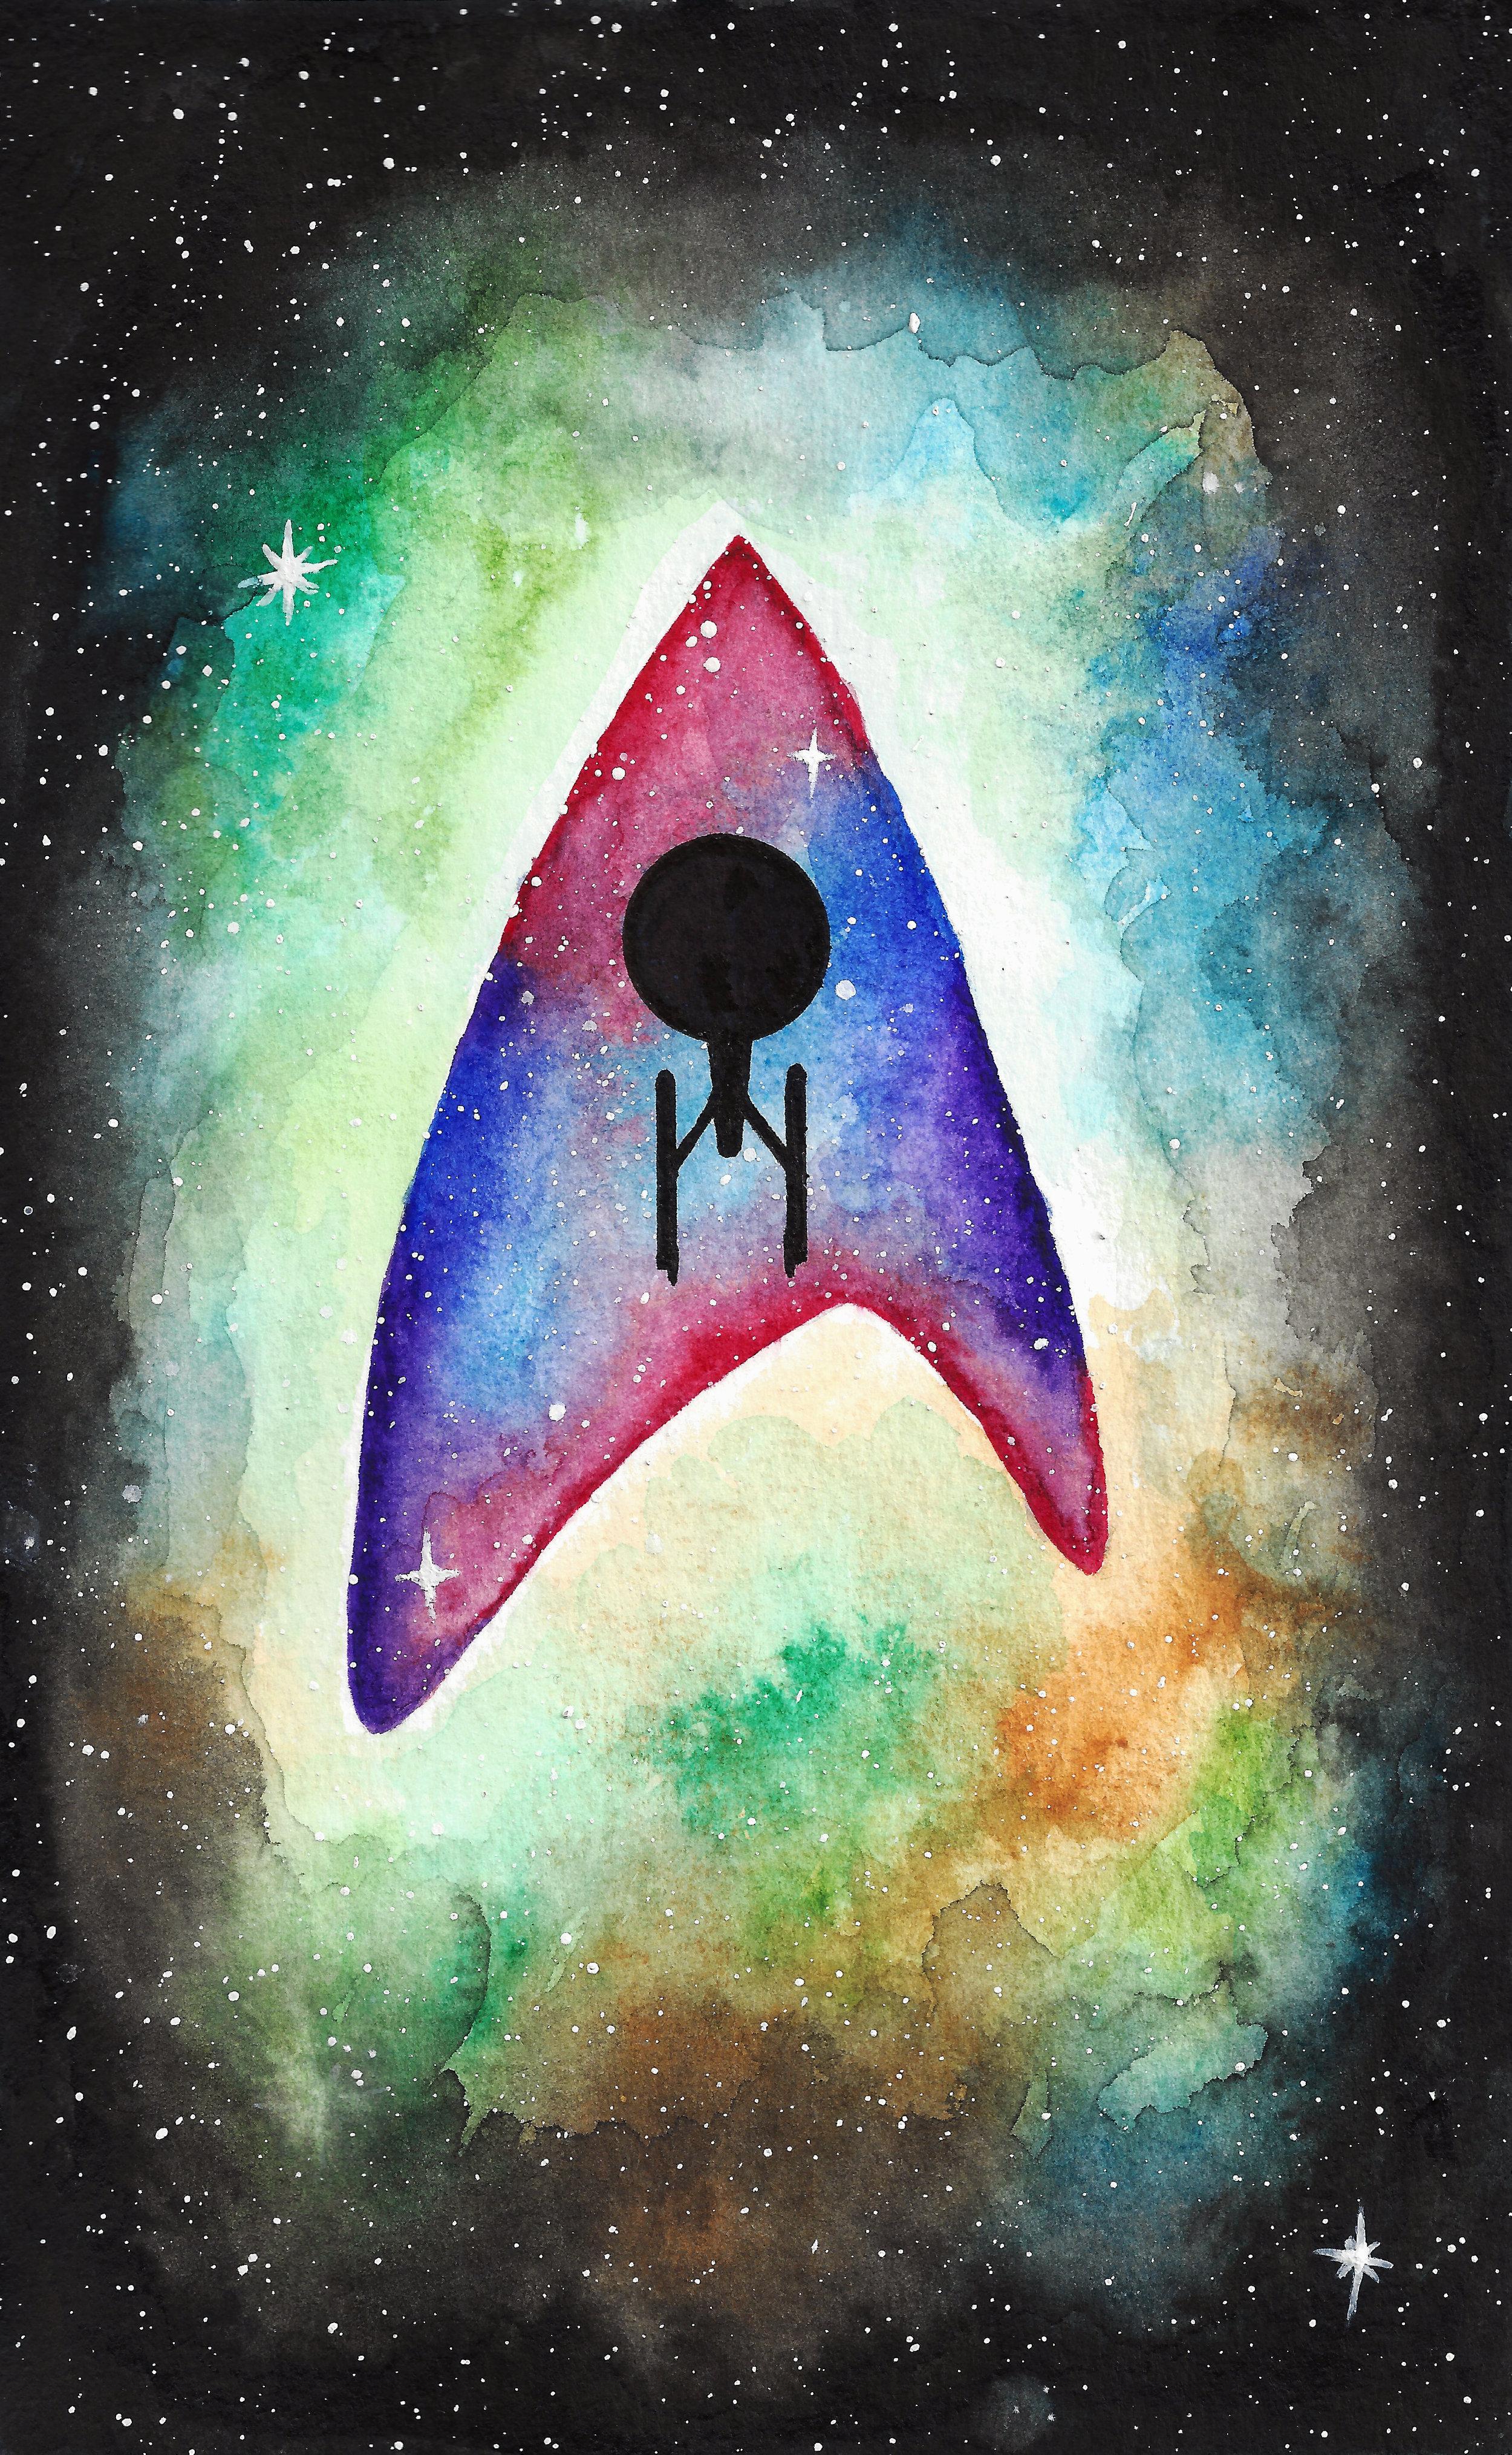 Star Trek Watercolour Painting // Plant Based Bride